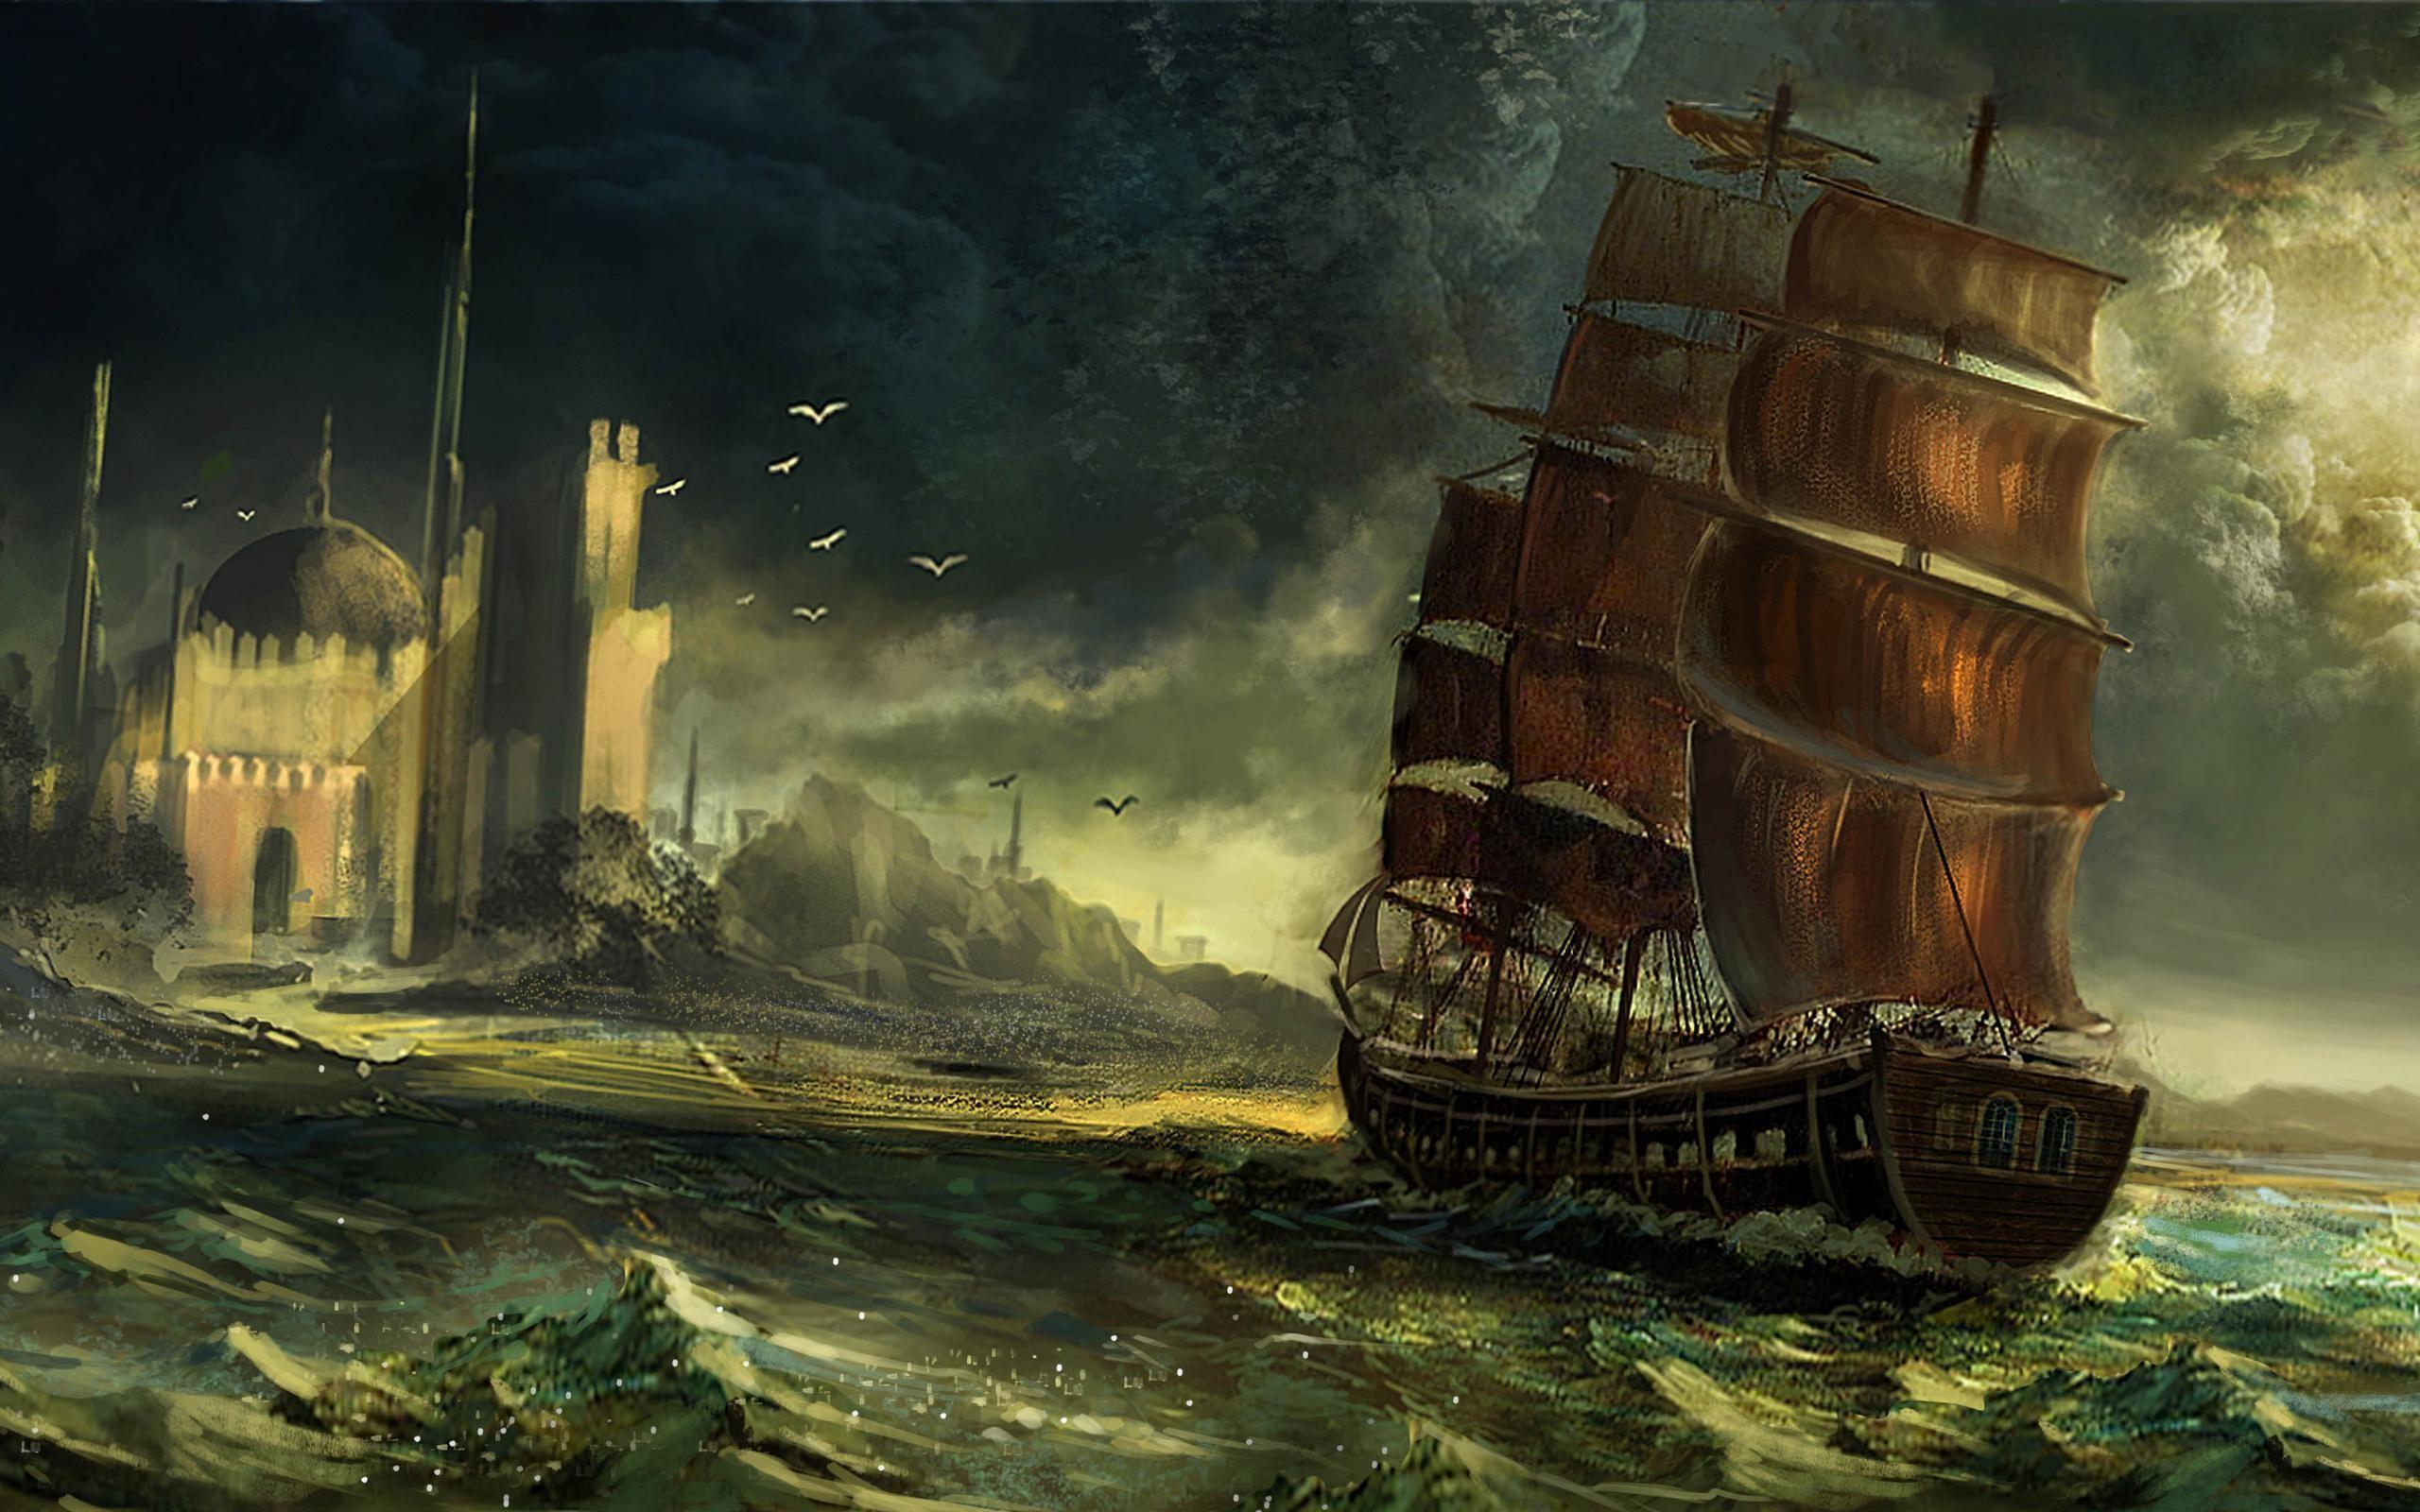 Pirate Ship #k8ni px 415.63 KB Other ghost pirate ship wallpaper  pirate pirate ship